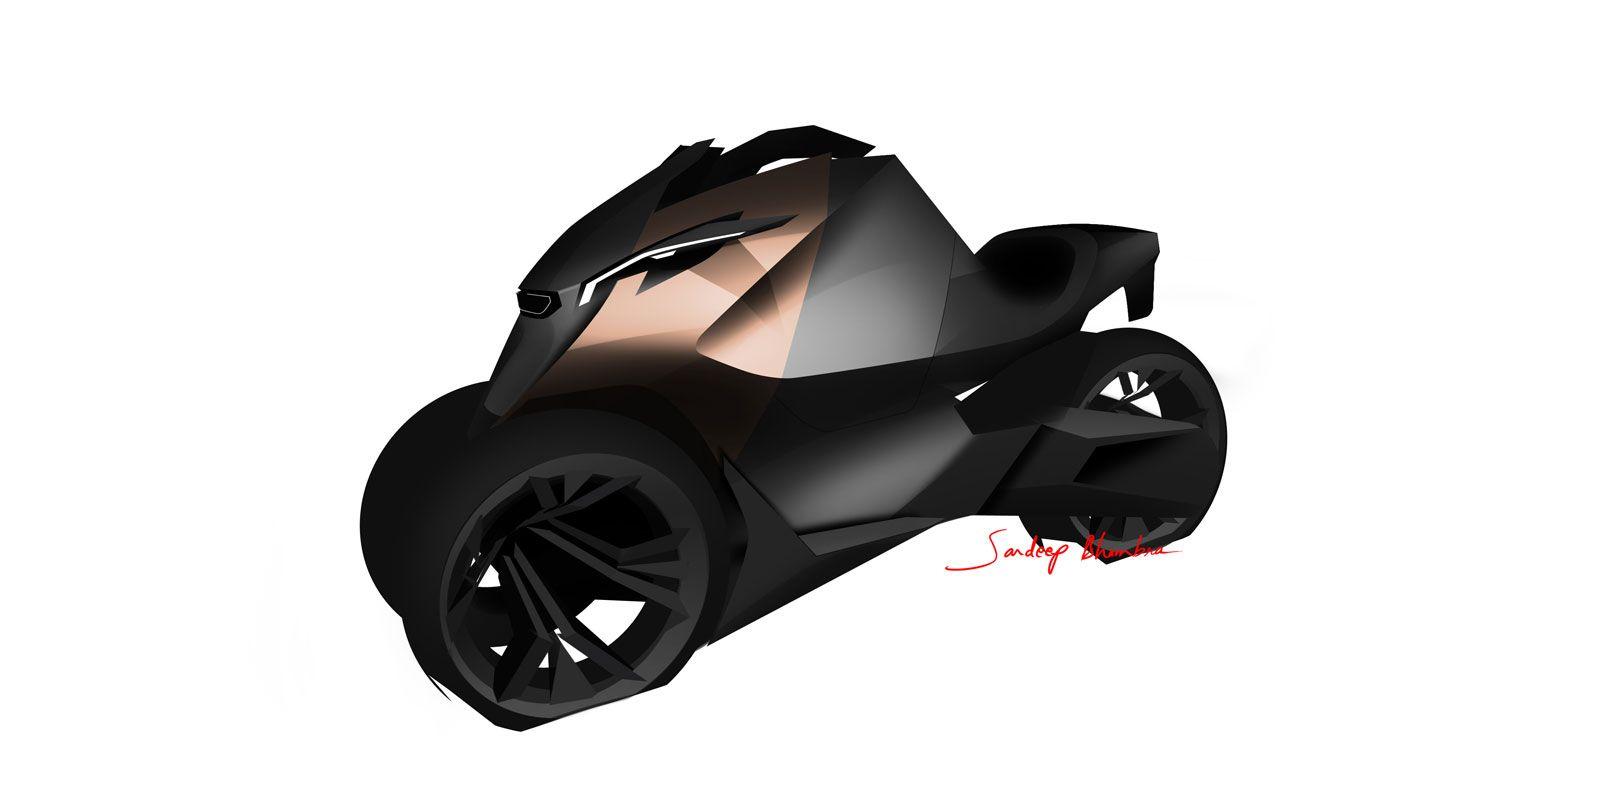 Peugeot Onyx Concept Scooter Design Sketch